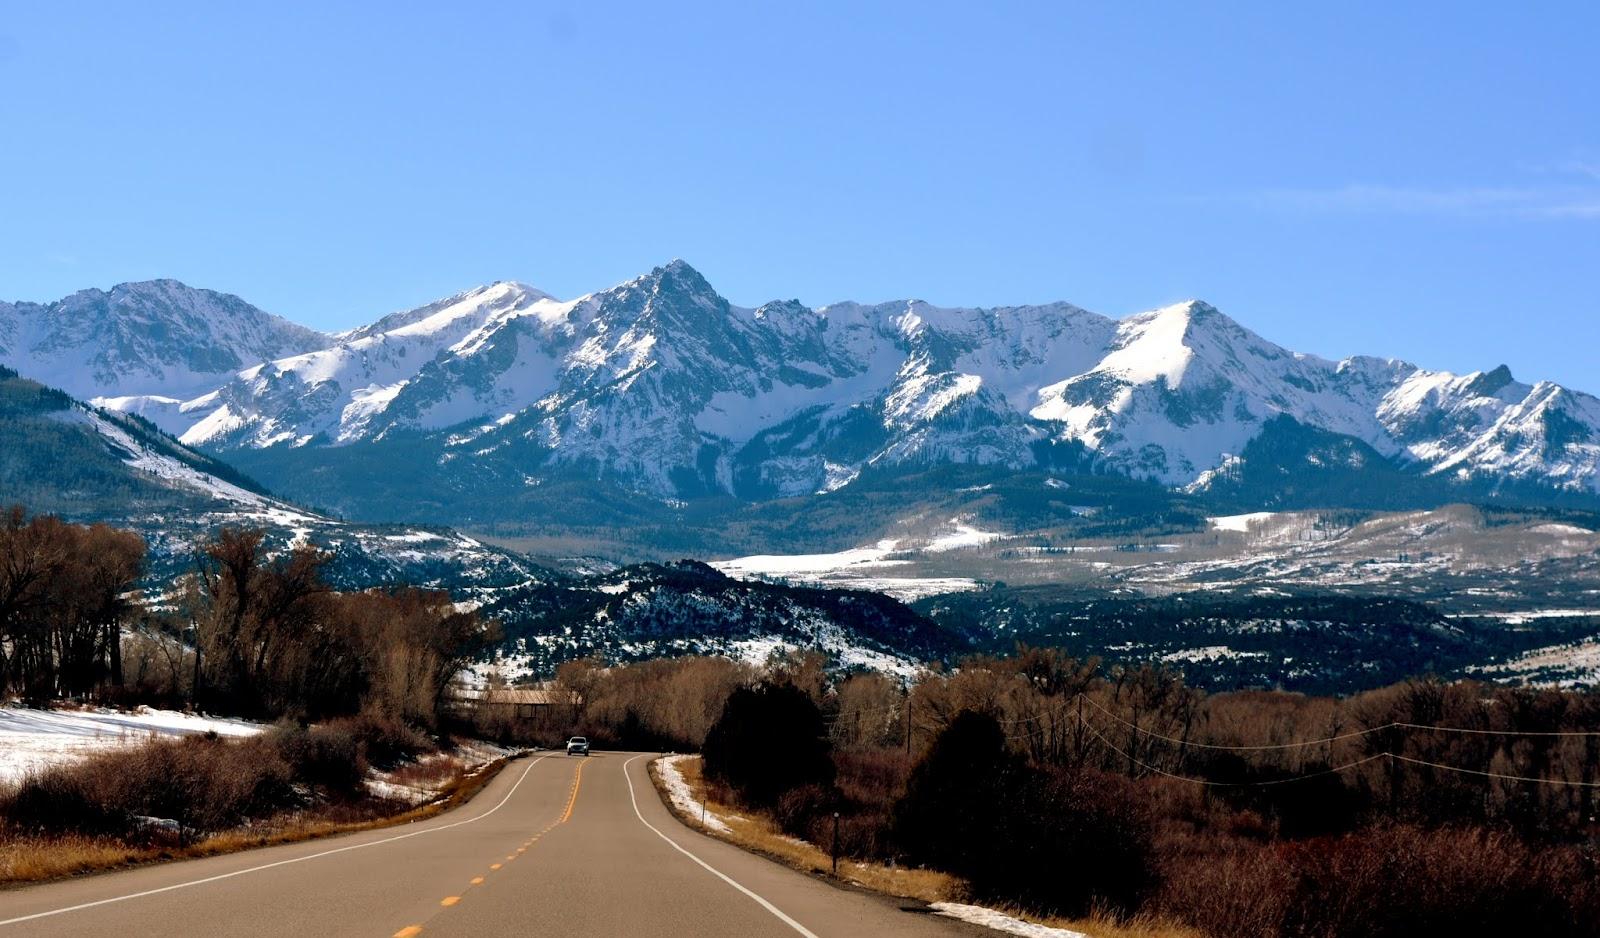 Mille Fiori Favoriti Ridgway ColoradoGateway to the